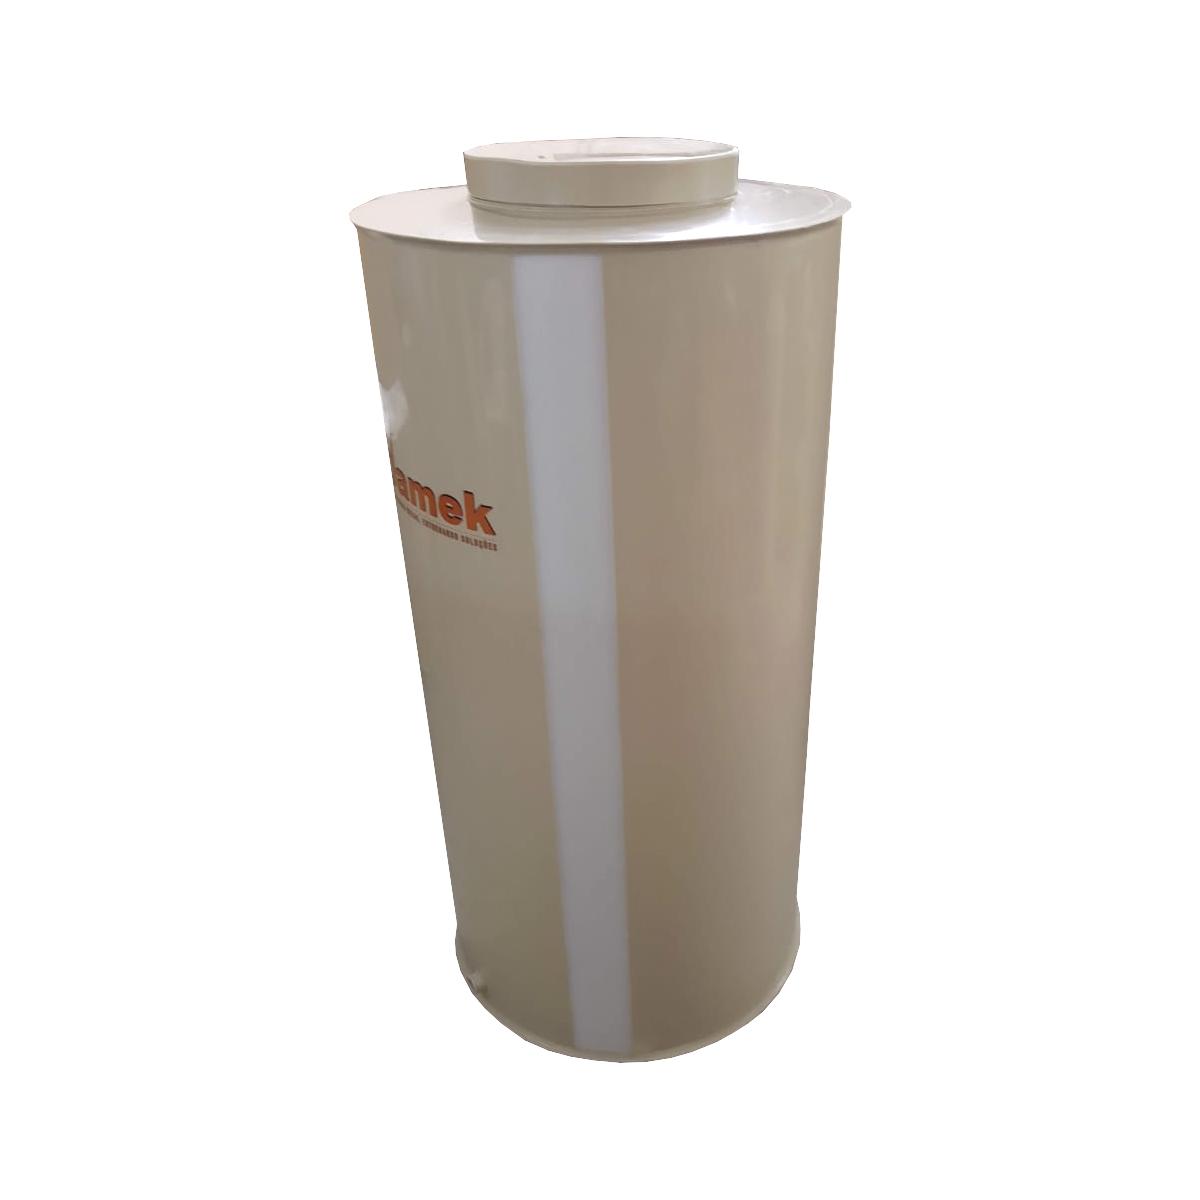 - Reservatório Plástico 200 L / Atóxico / Sem Visor Nível